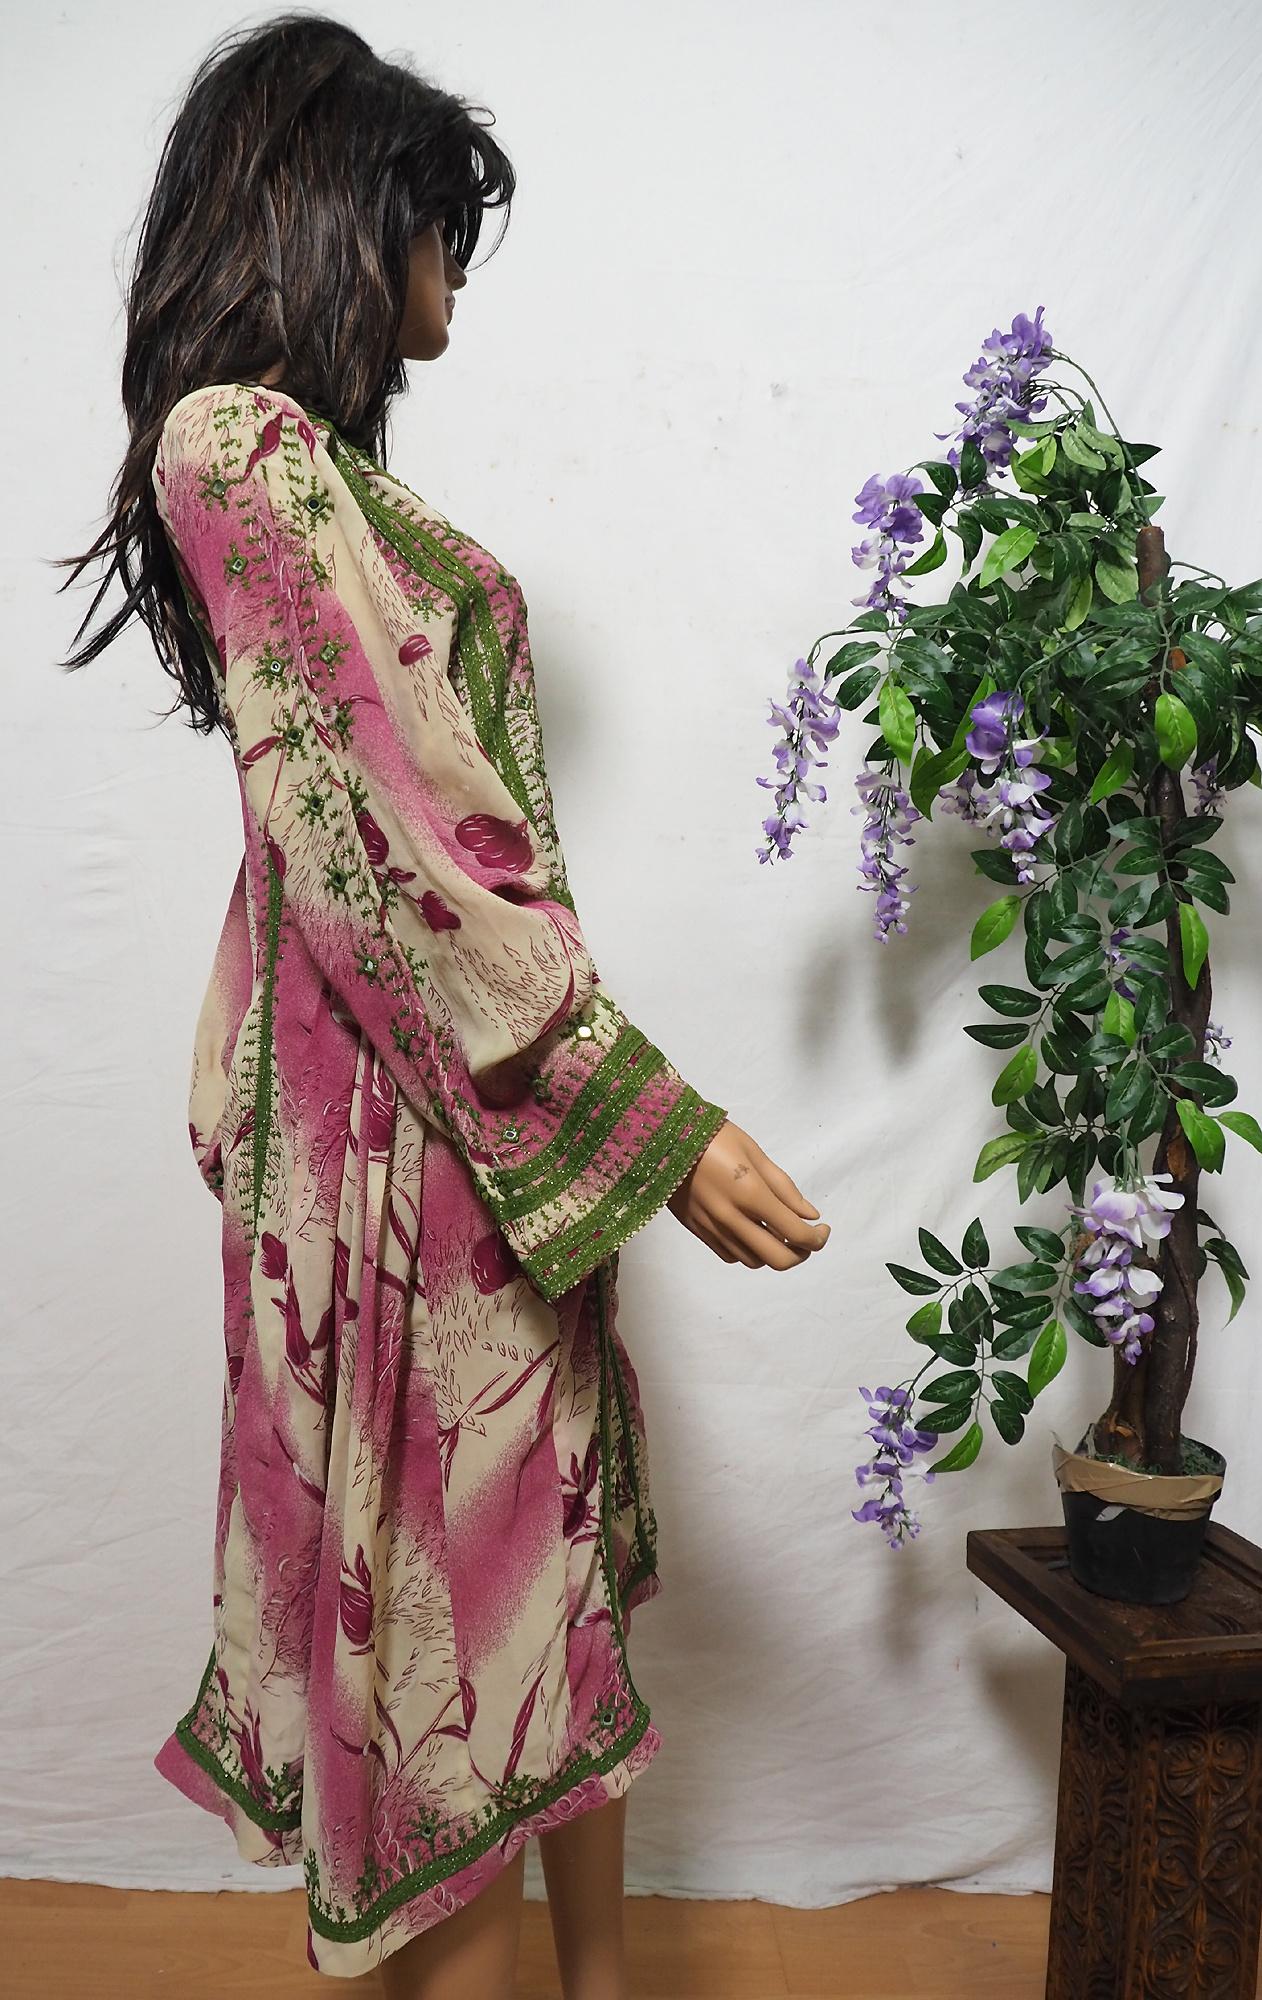 alt Beloschi Frauen Hochzeit Kleid Belutschistan Pakistan Afghanistan Nr-21/8